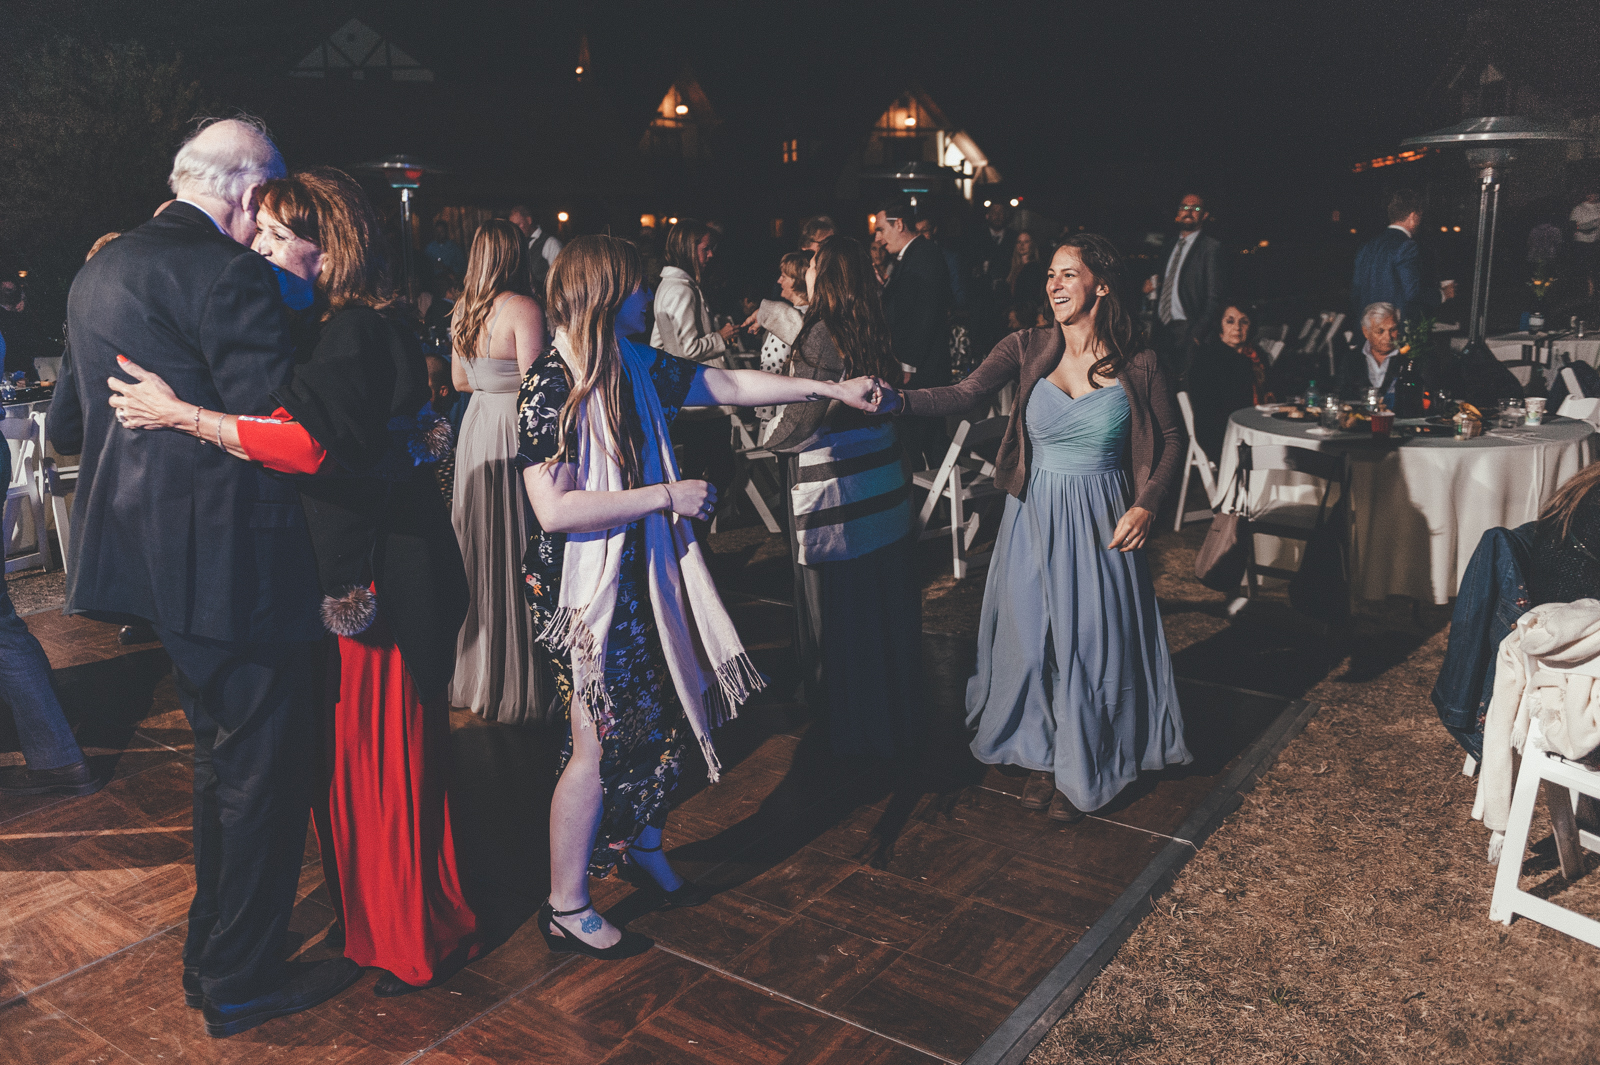 ChadFahnestockPhotography-estes-park-wedding-photography-059.jpg